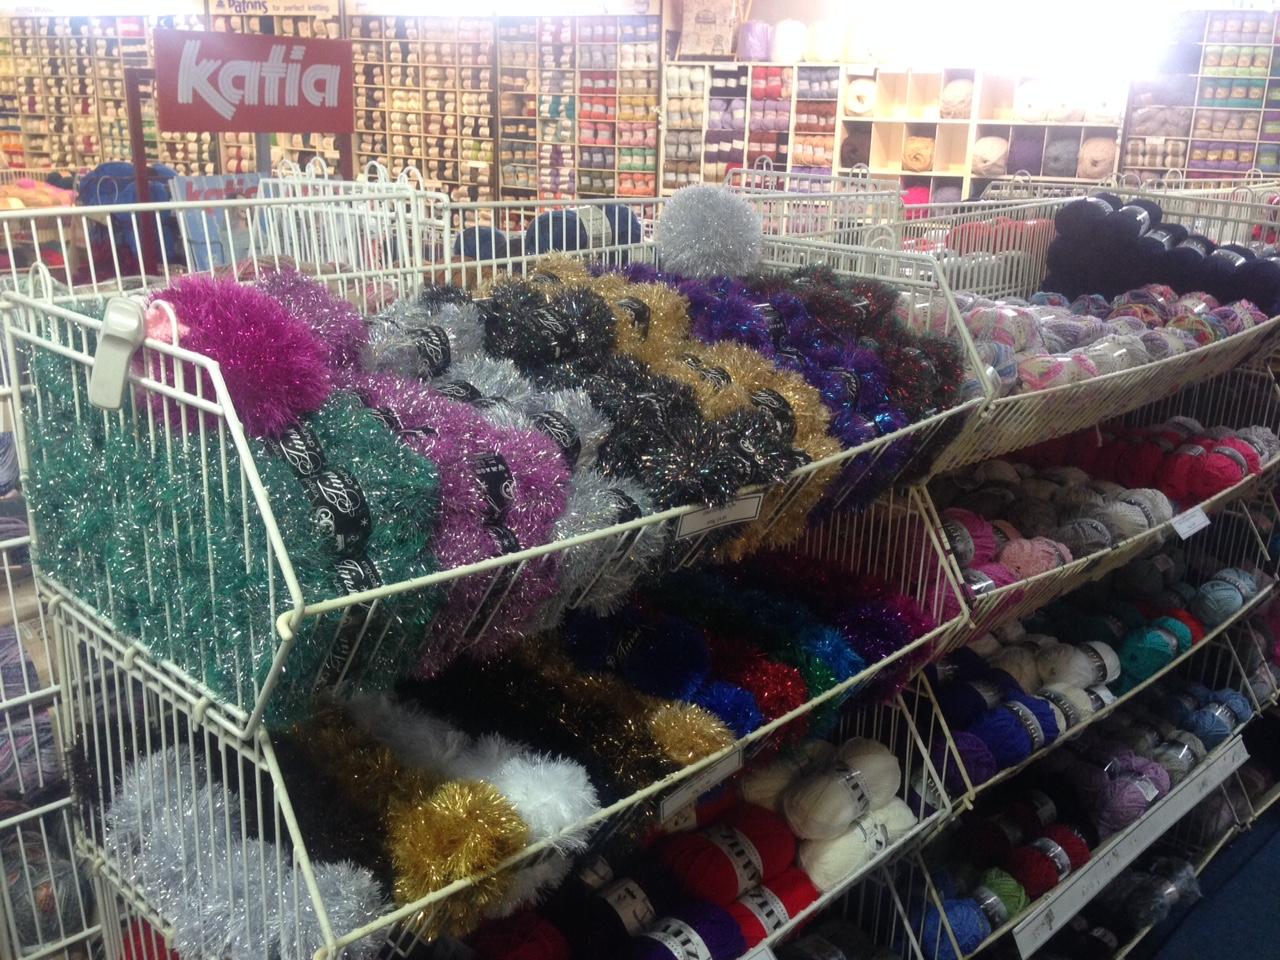 knitting supplies supermarket